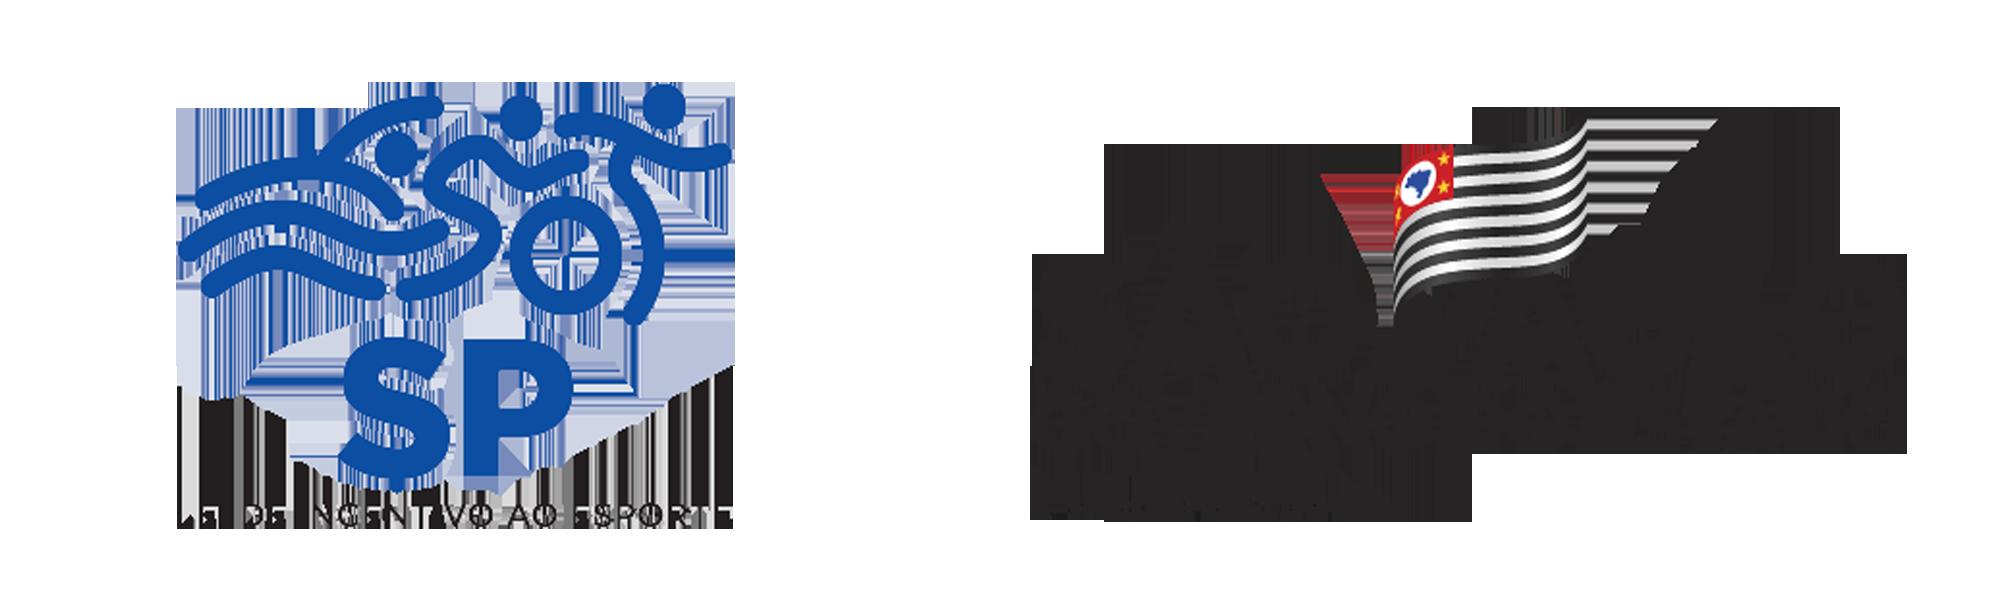 Logotipo Estado de São Paulo